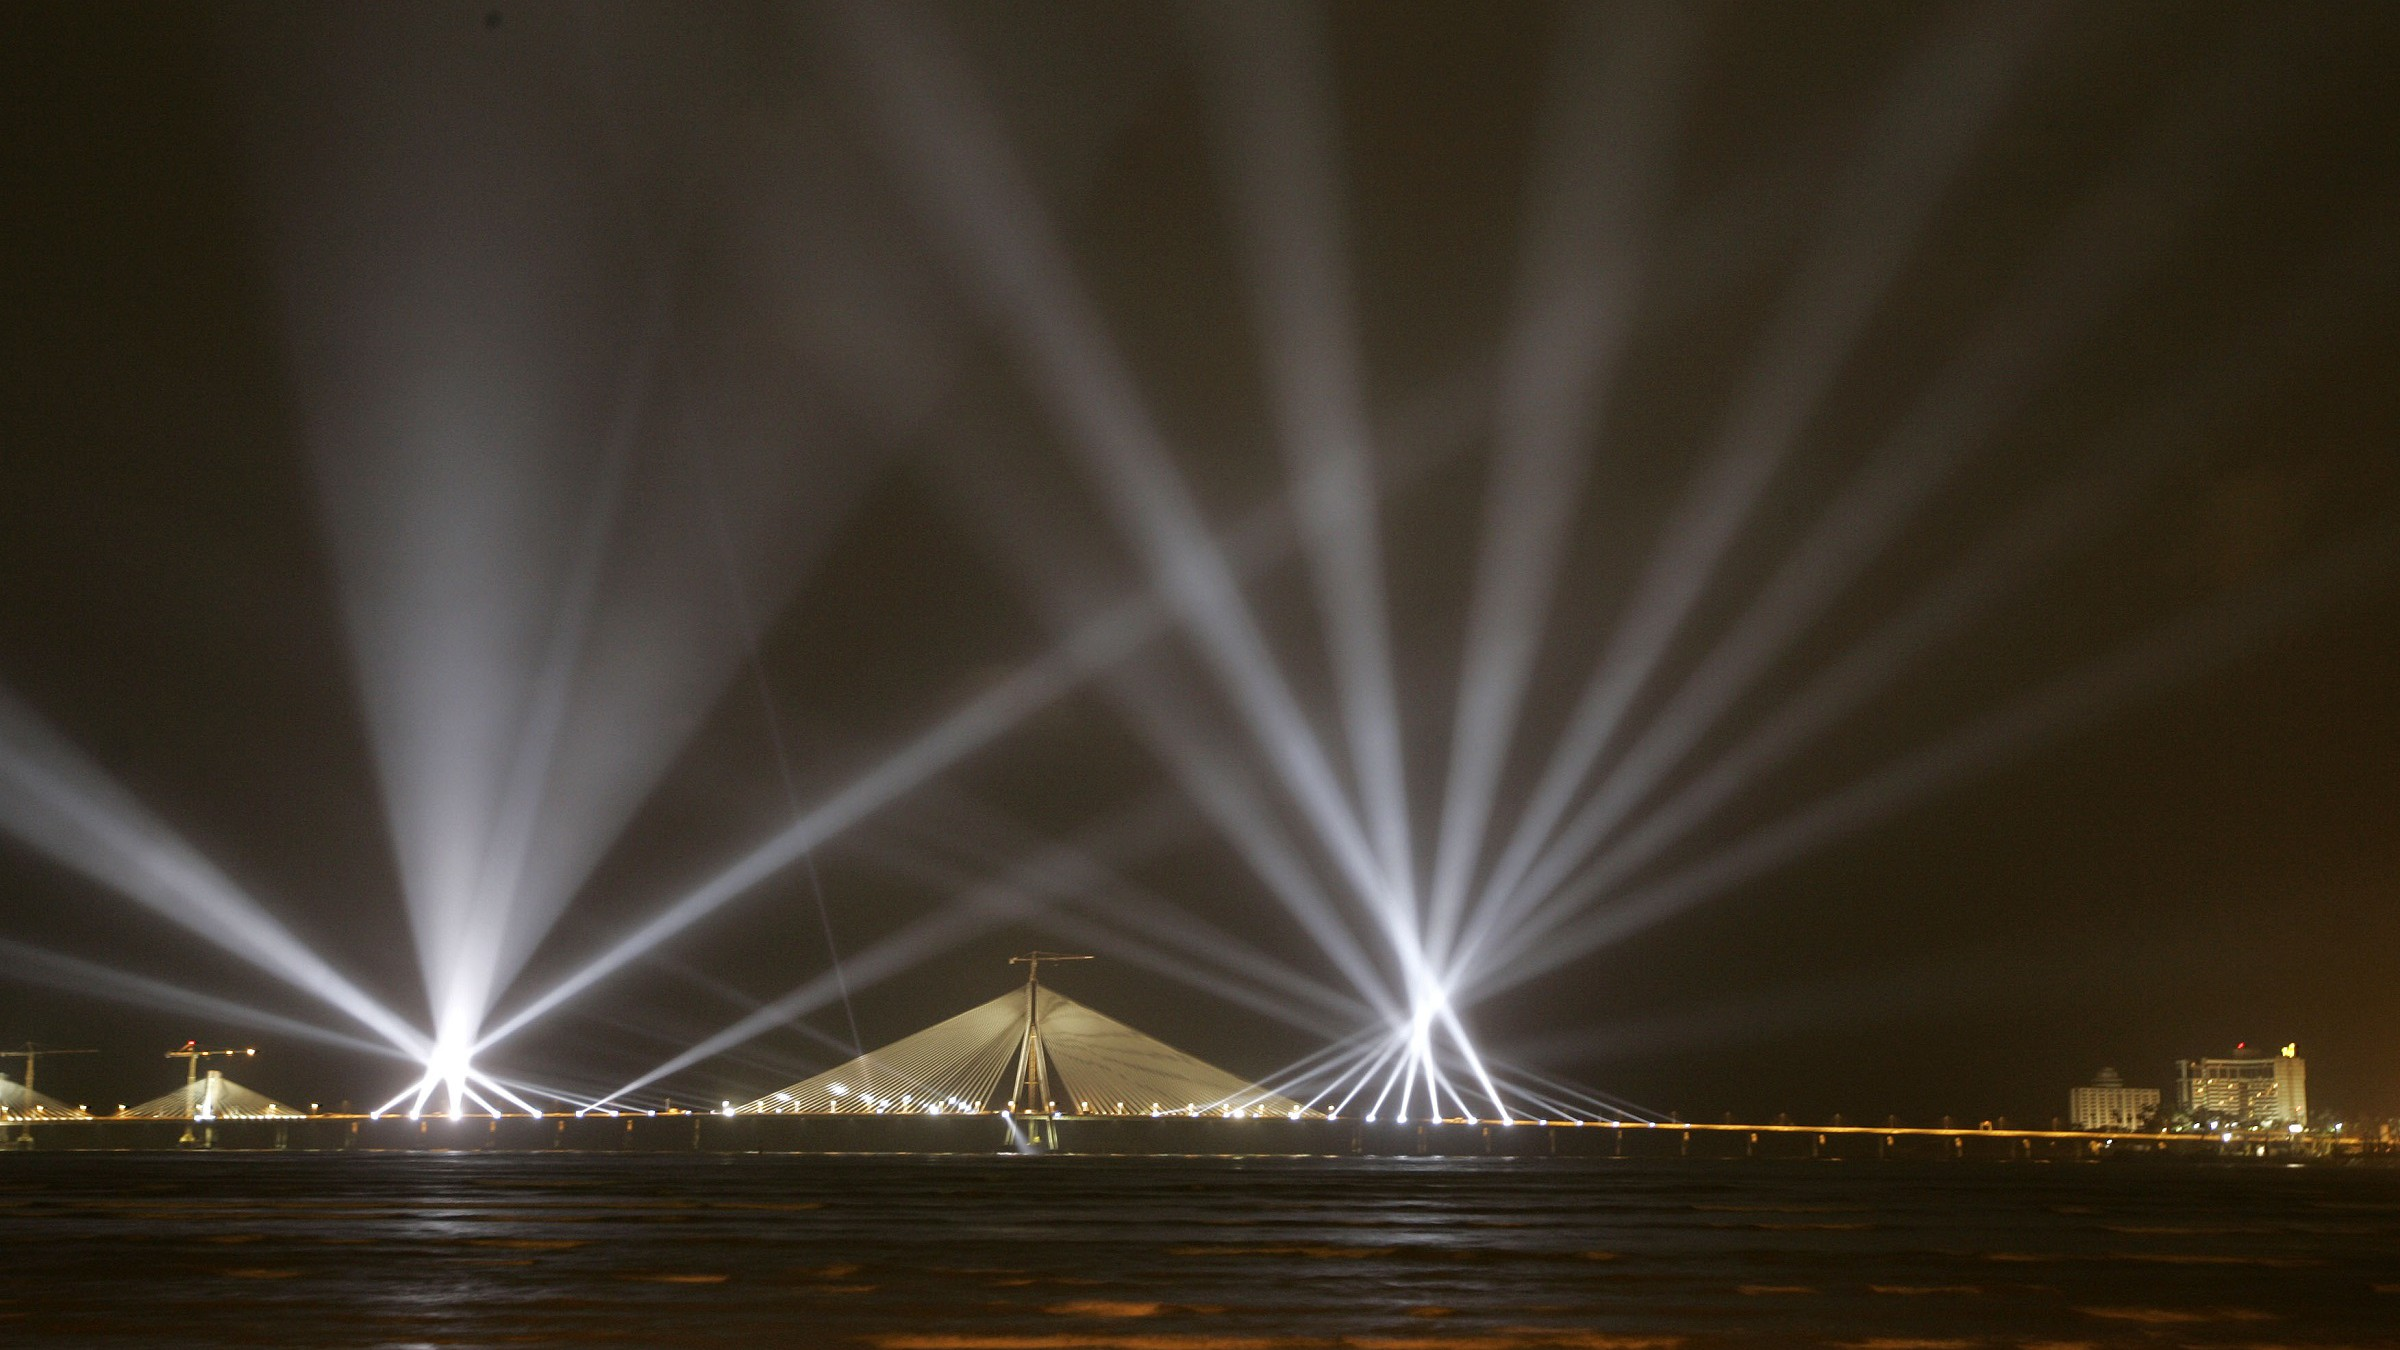 Rehearsal of laser show is seen at the 5.6 kilometers (3 miles) long Bandra-Worli Sea Link (BWSL) in Mumbai, India, Sunday, June 28, 2009. BWSL which will connect the suburban Bandra with Worli in south Mumbai will be inaugurated on June 30. (AP Photo/Rajanish Kakade)